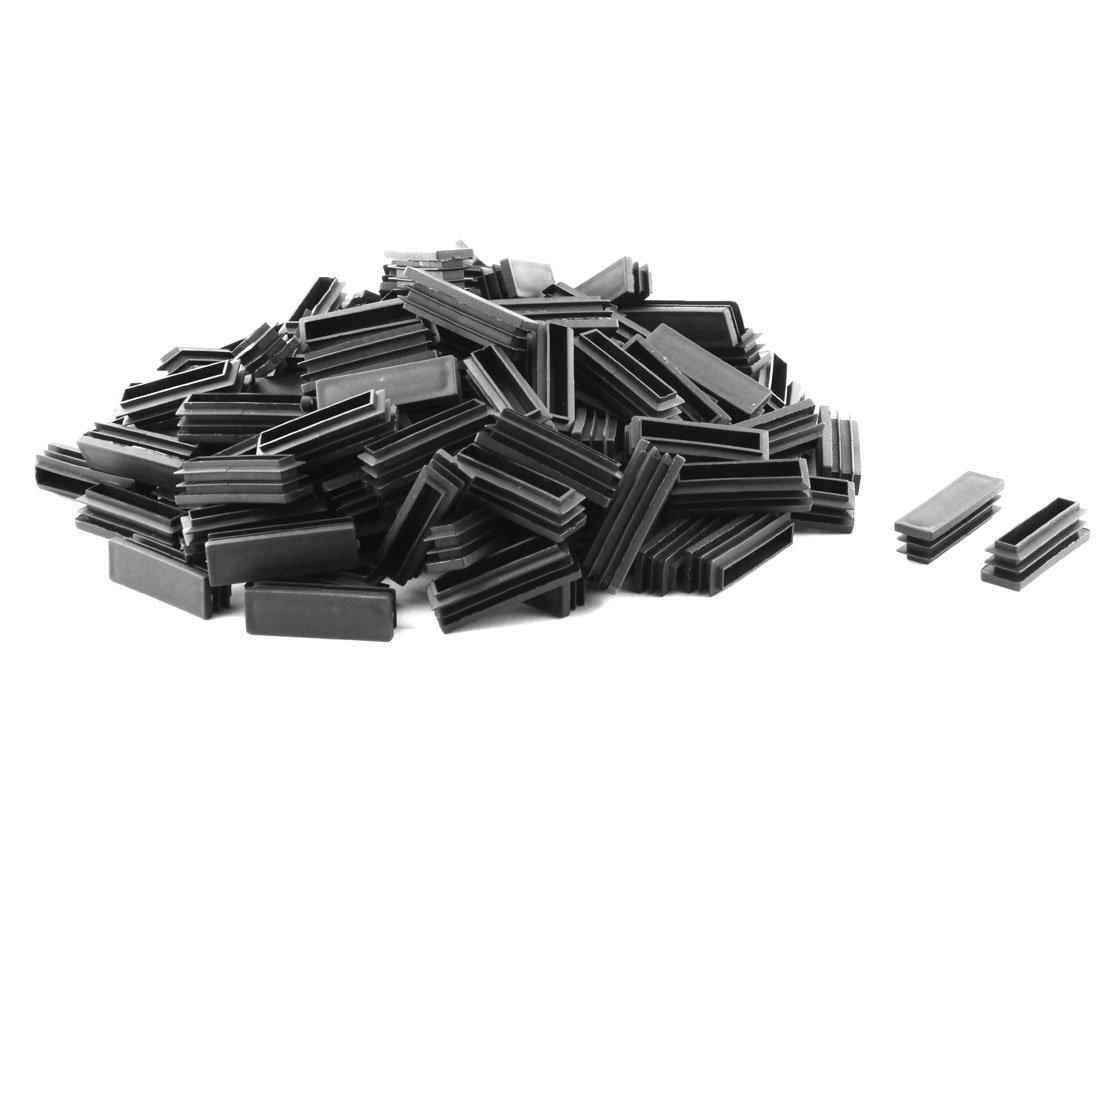 uxcell Plastic Home Office Rectangle Shape Table Chair Leg Tube Insert 15 x 50mm 150 Pcs Black